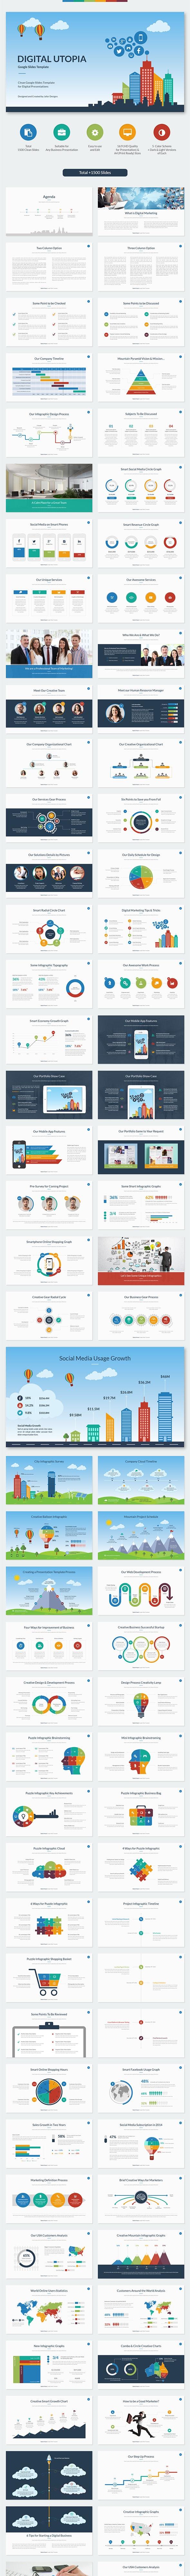 Digital Utopia Google Slides Template - Google Slides Presentation Templates